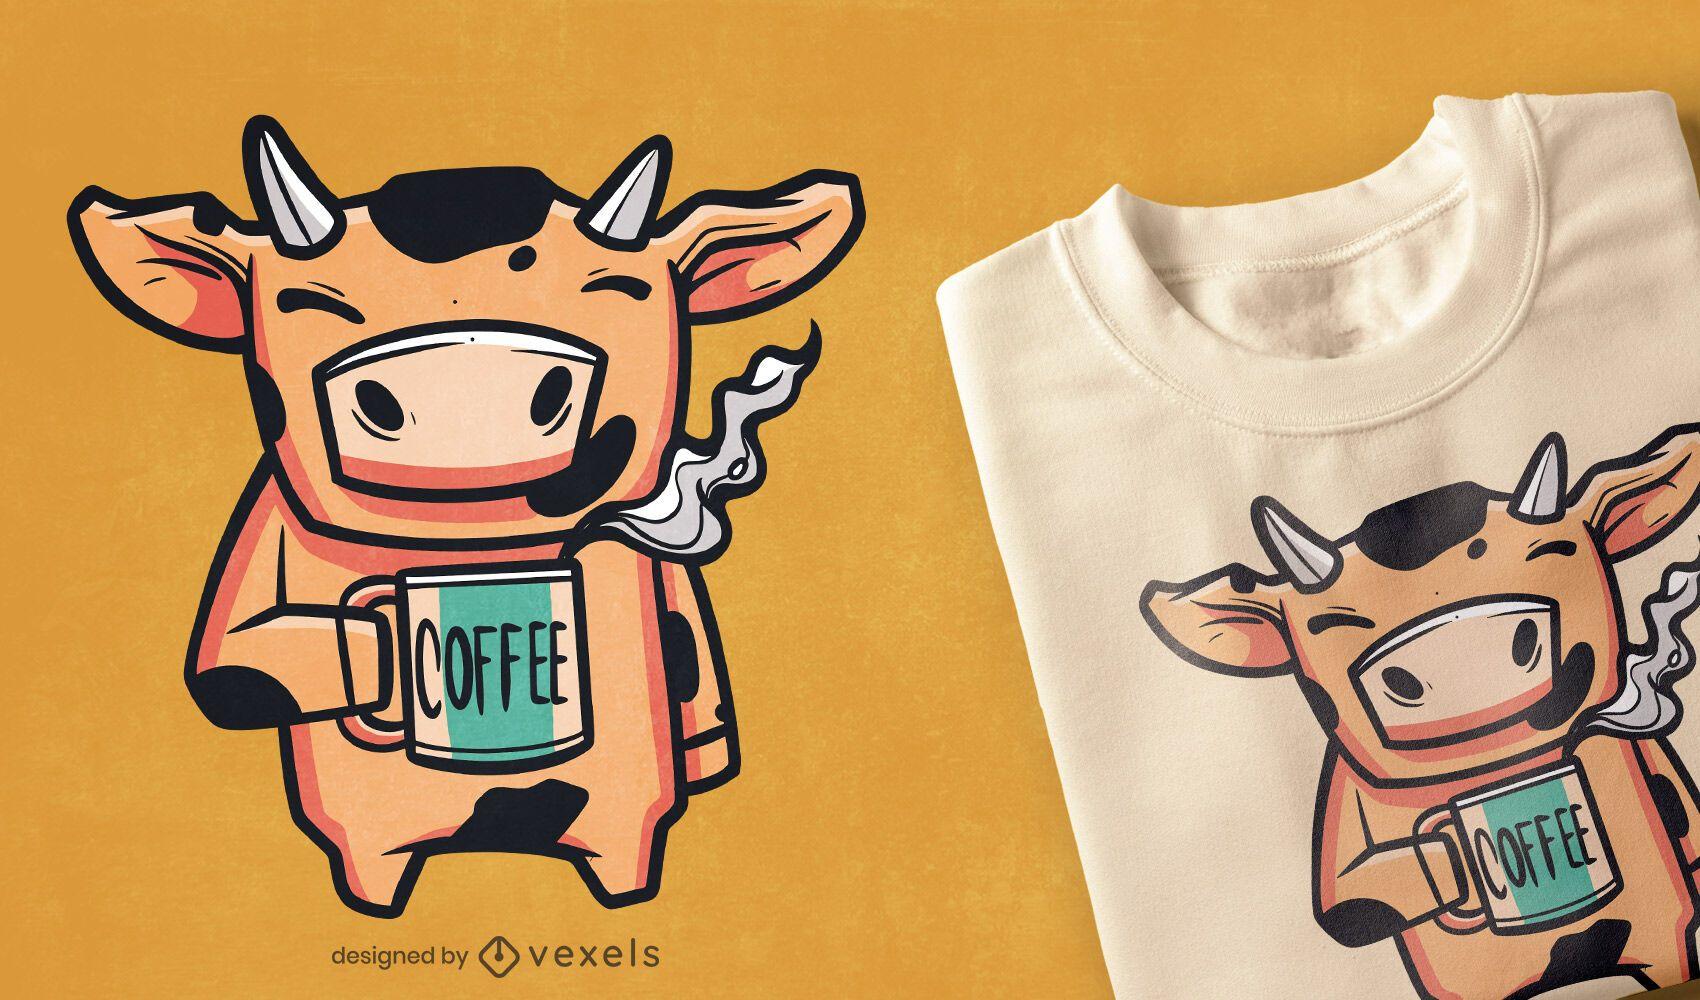 Dise?o de camiseta de vaca de caf?